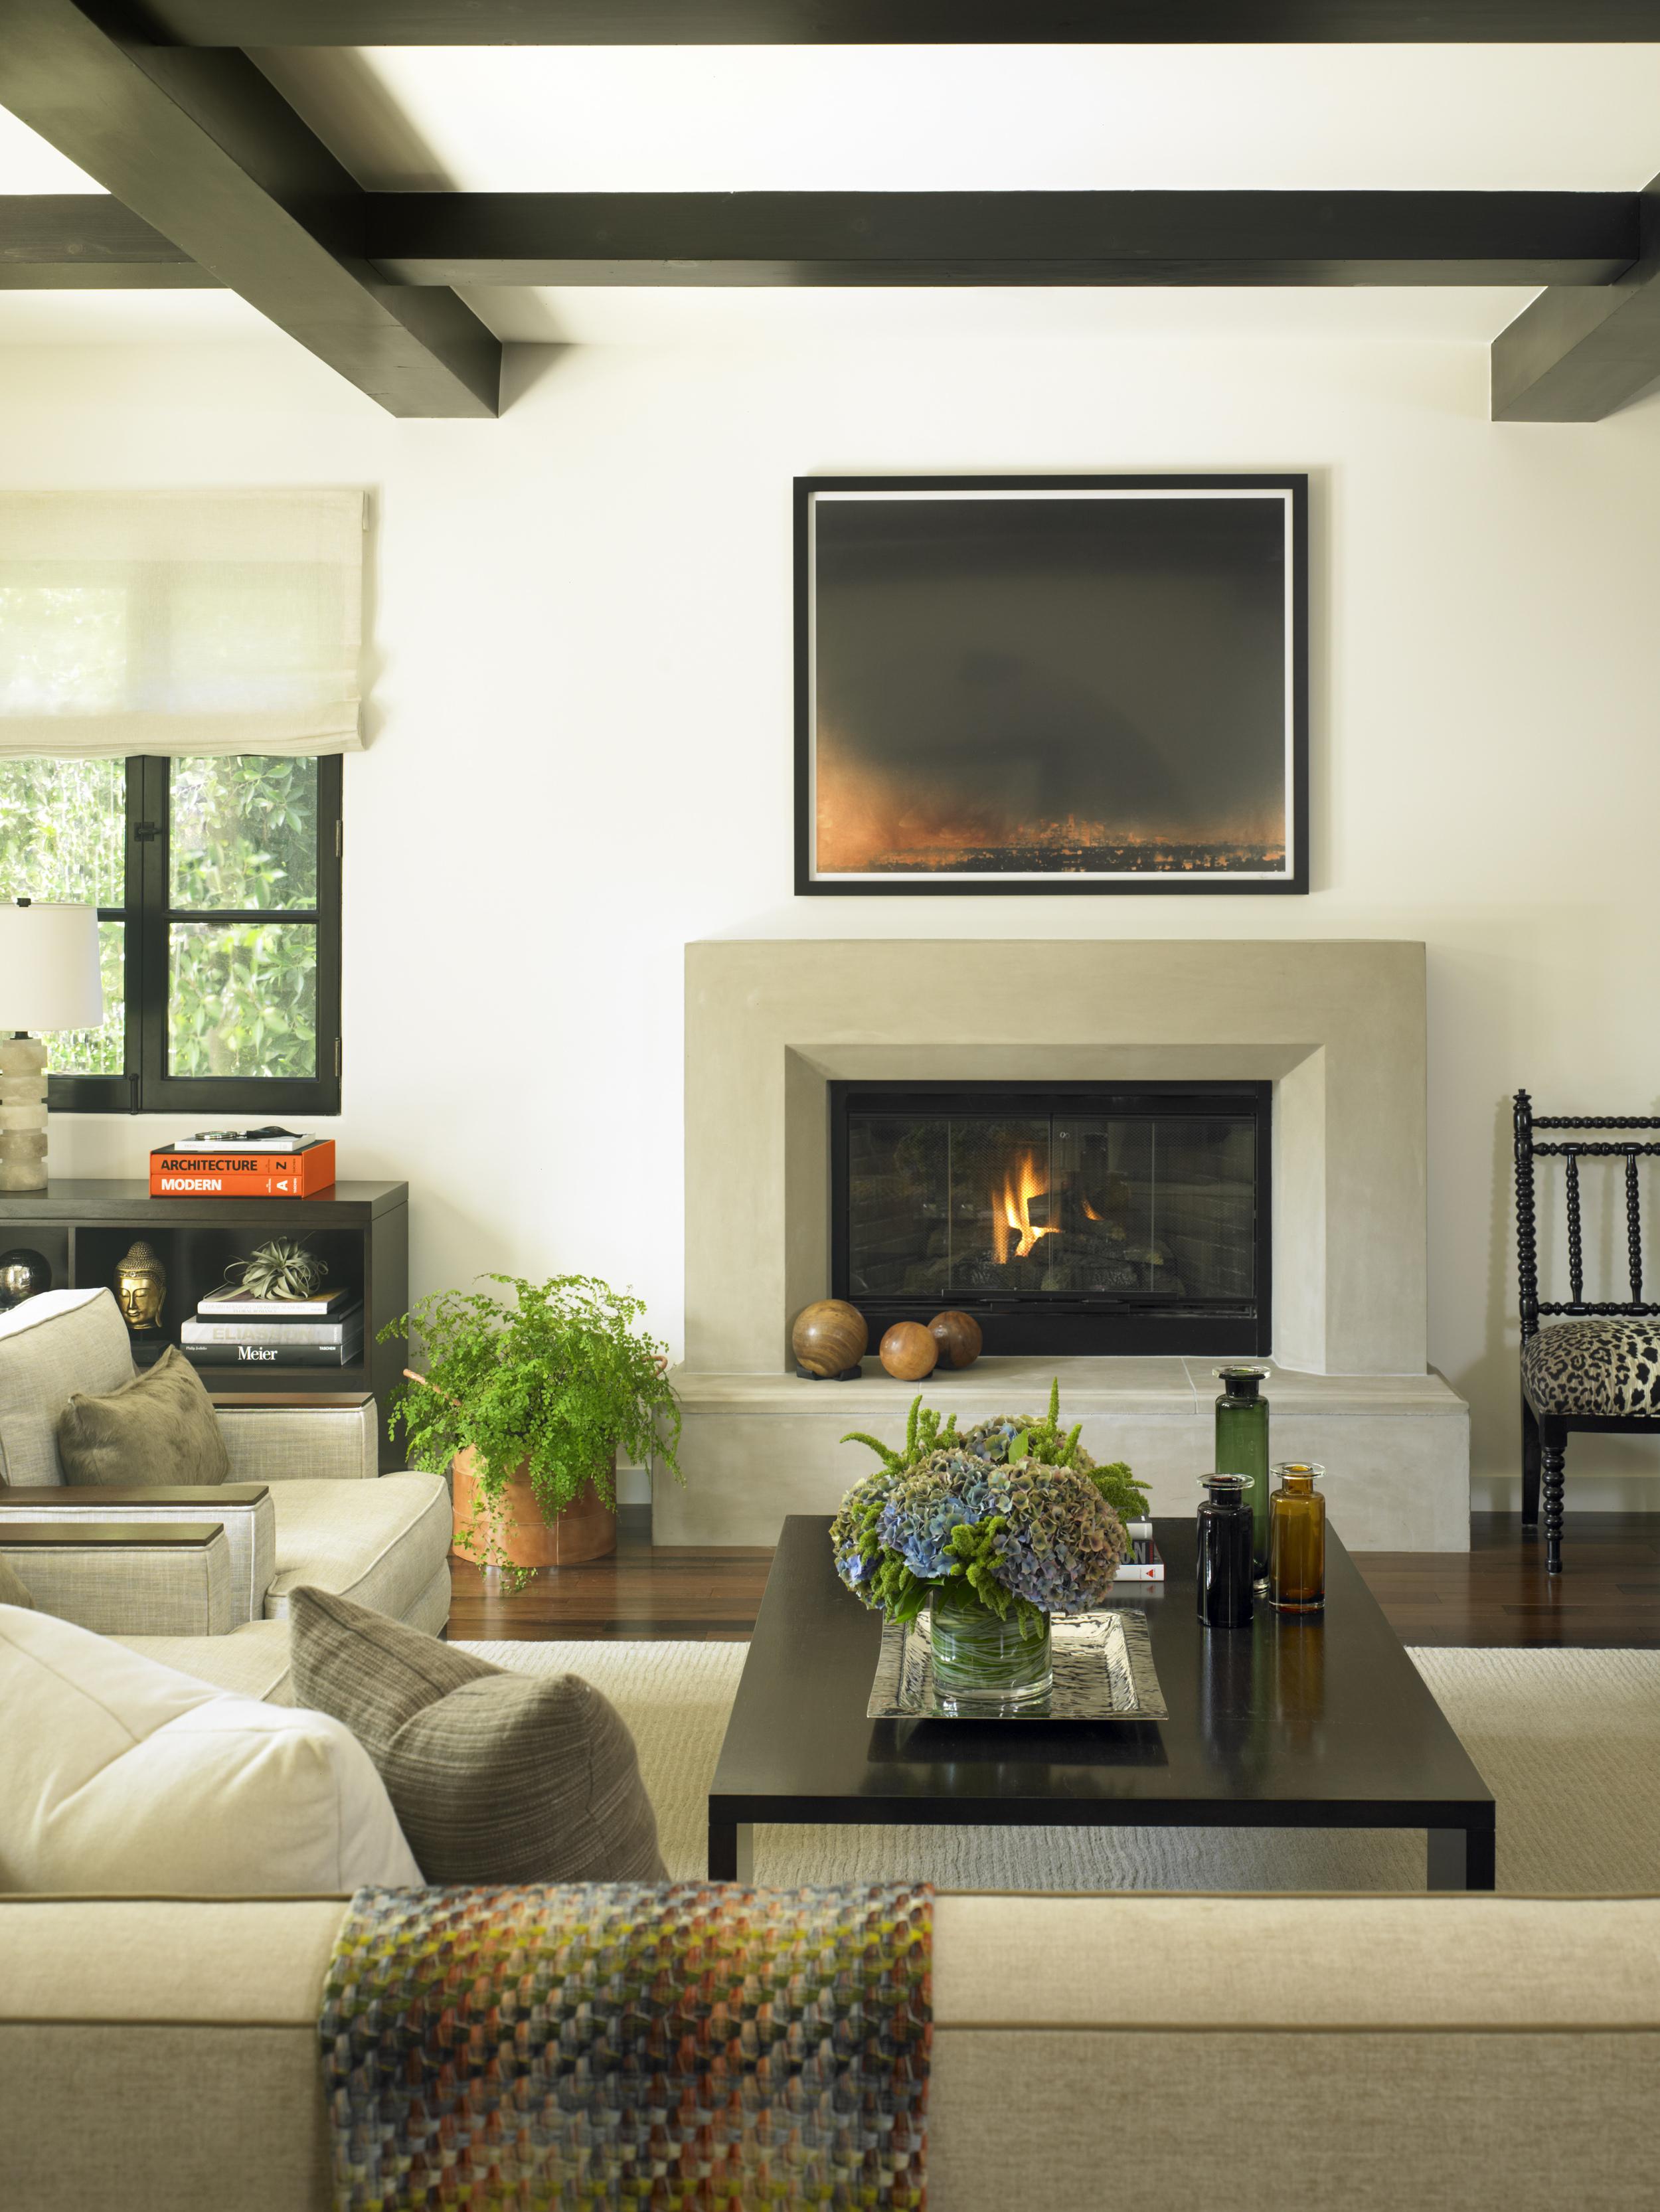 Kadlec Architecture + Design - West Hollywood Bungalow 5.jpg